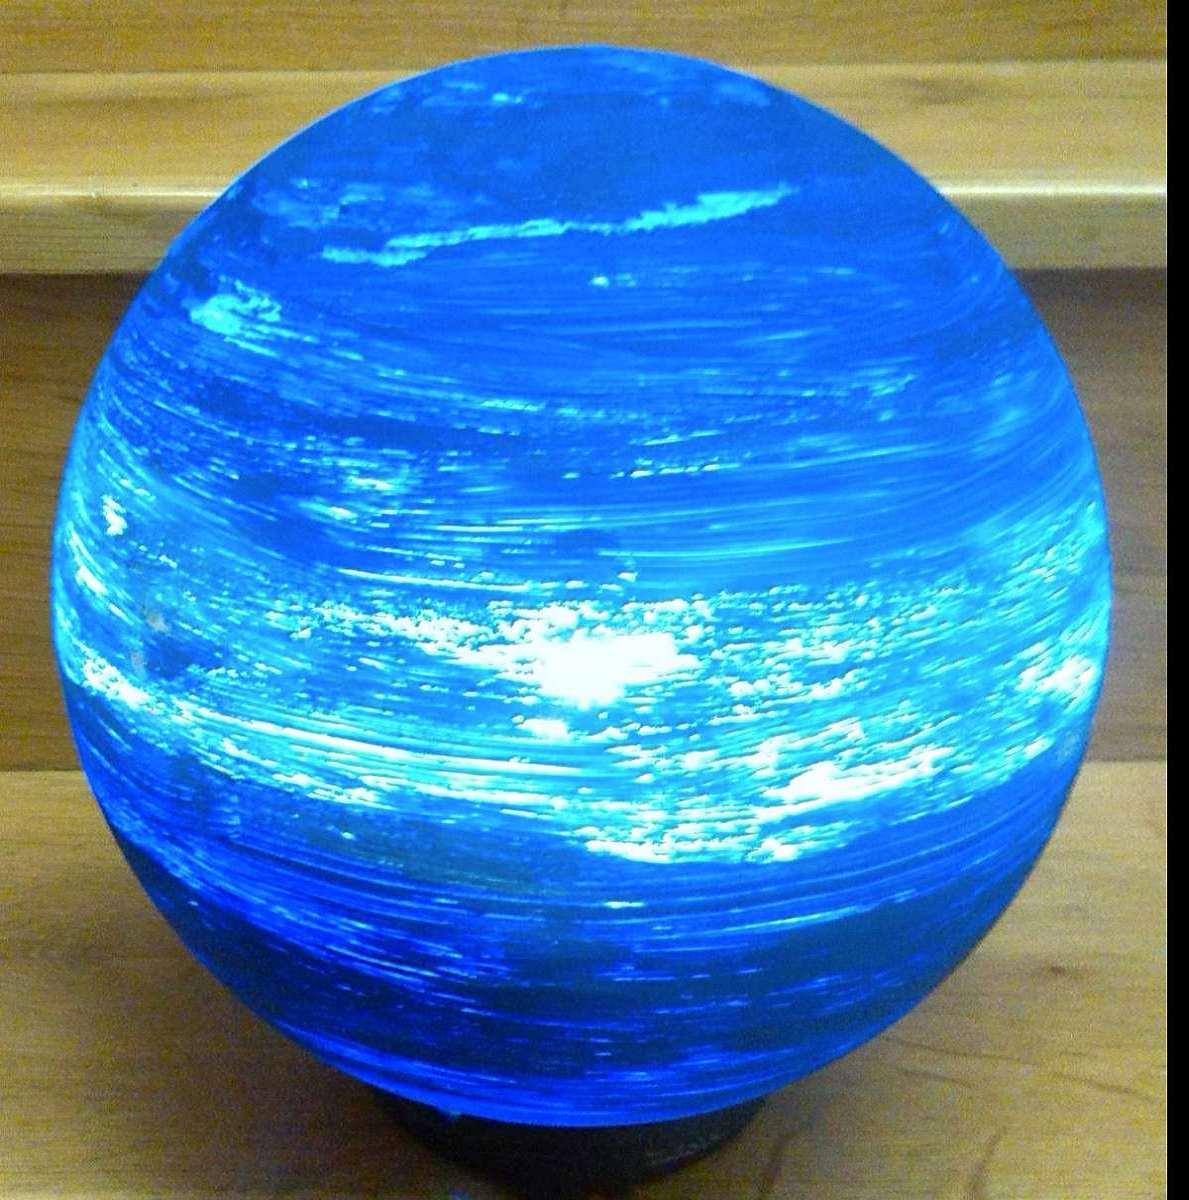 ... Bathtub Drain Stopper Stuck Closed by 100 Eye Of Sauron Desk Lamp  Amazon Amazon Com ... - 16+ [ Bathtub Drain Stopper Stuck Closed ] 100 Rayo Oil Lamp